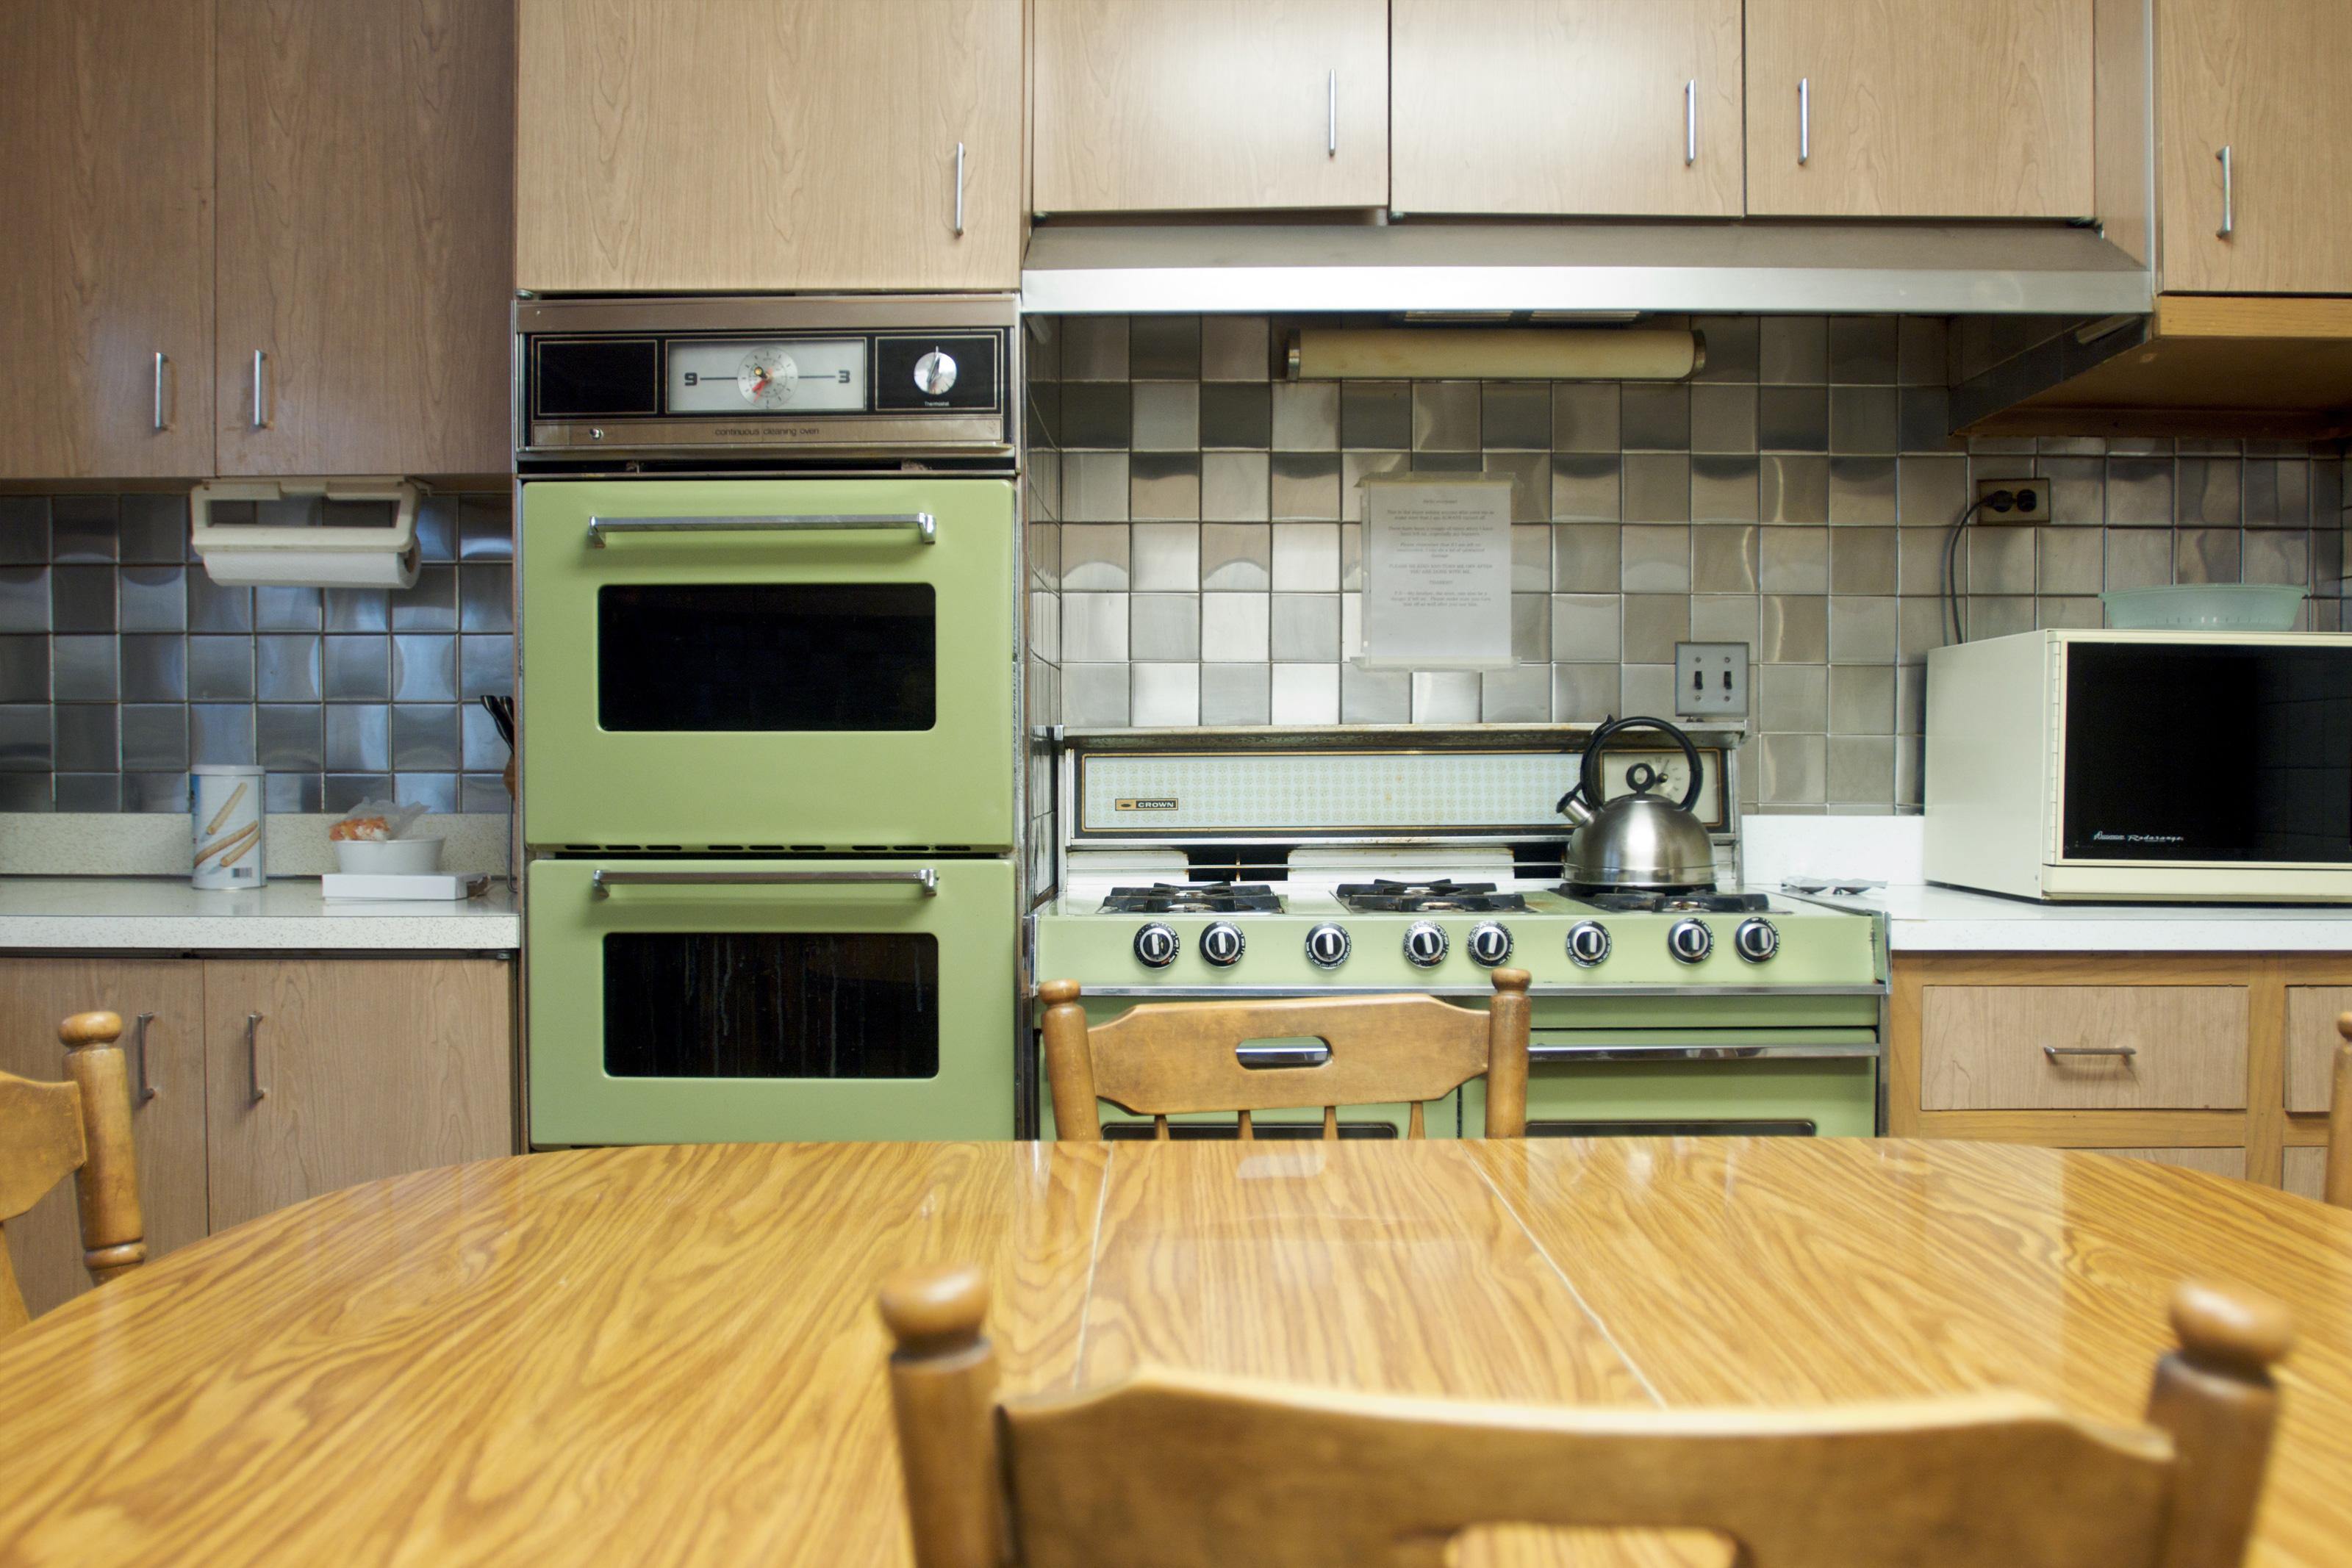 Avocado green kitchen